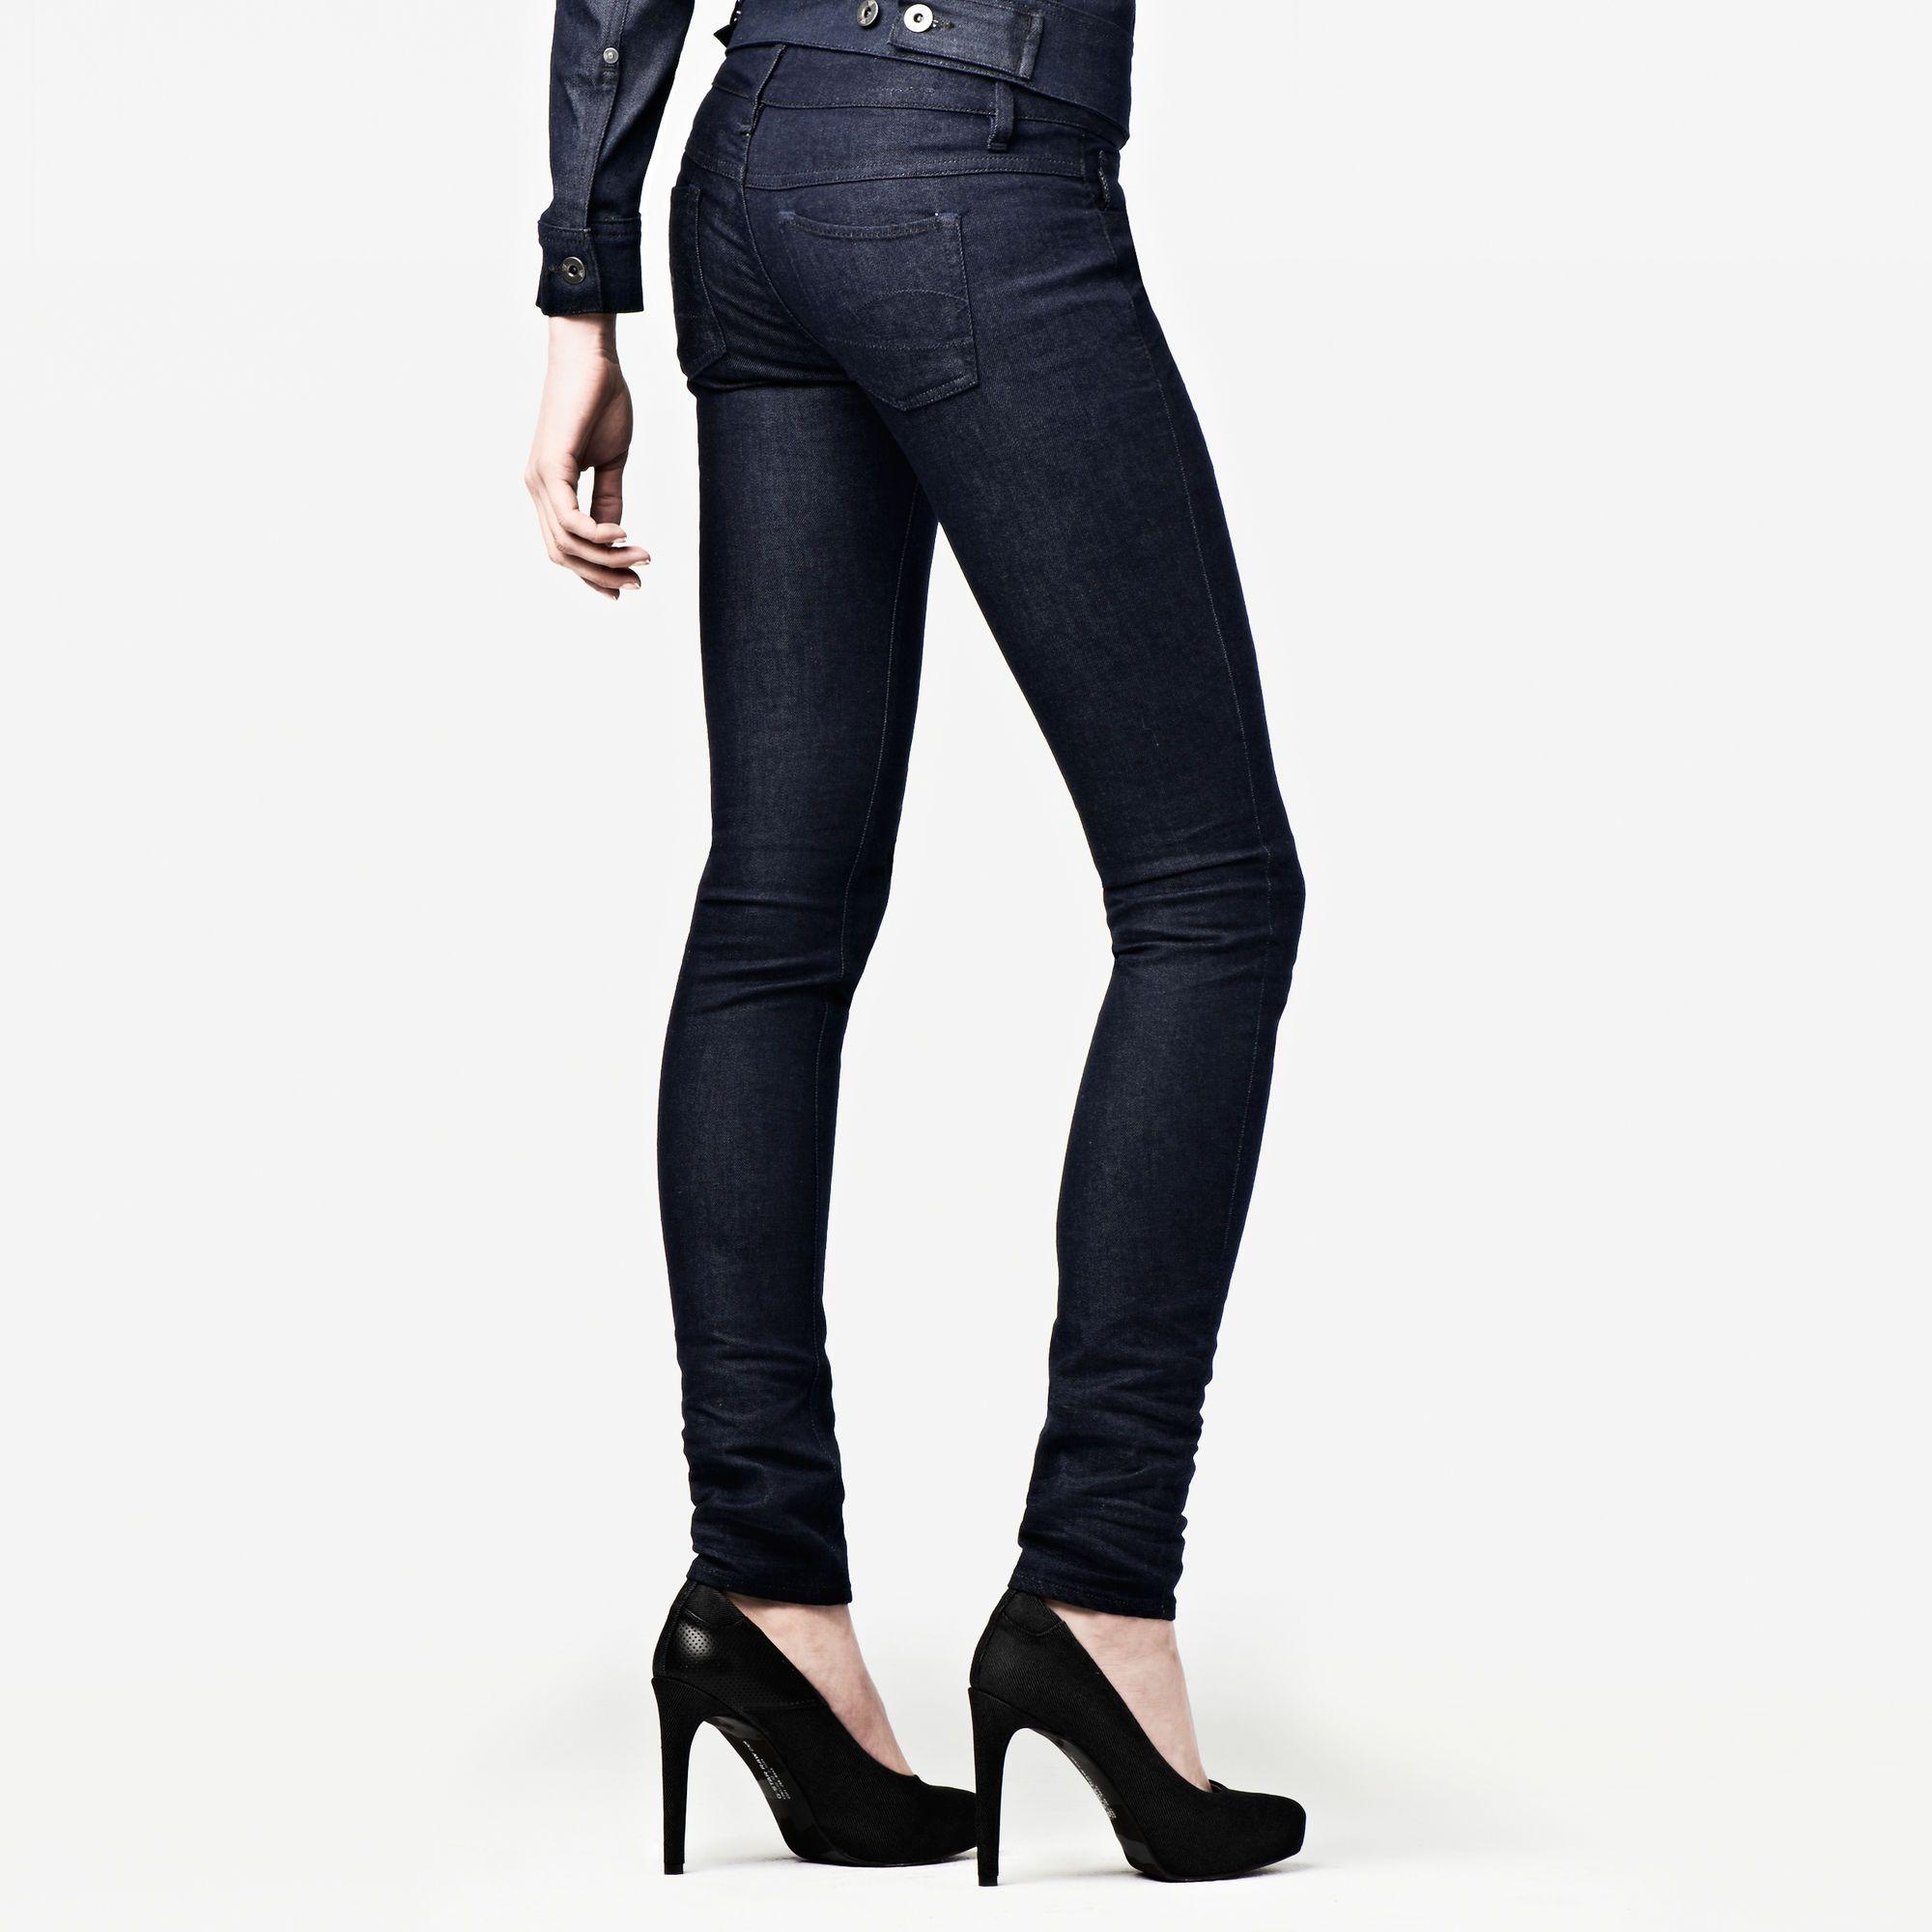 G-Star RAW Dexter Slinky Super Skinny Jeans